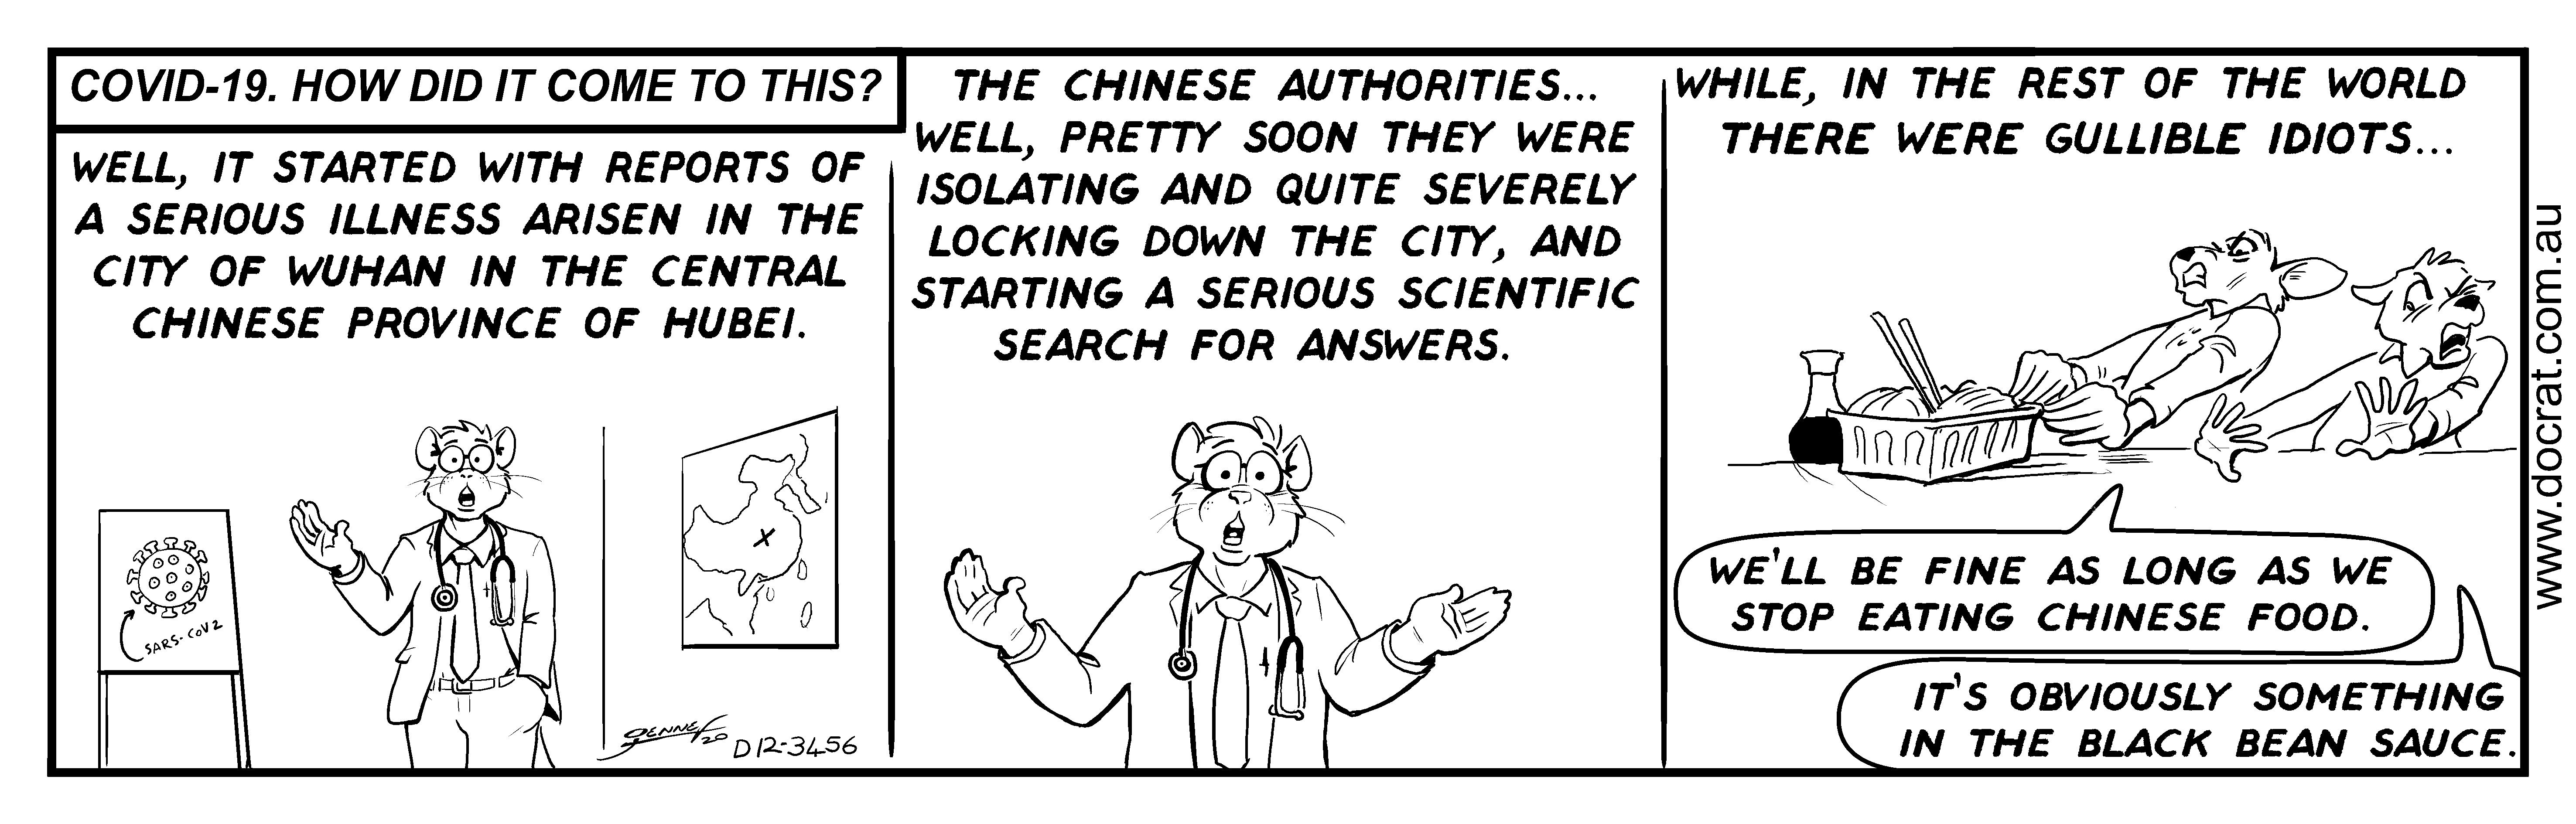 20200413